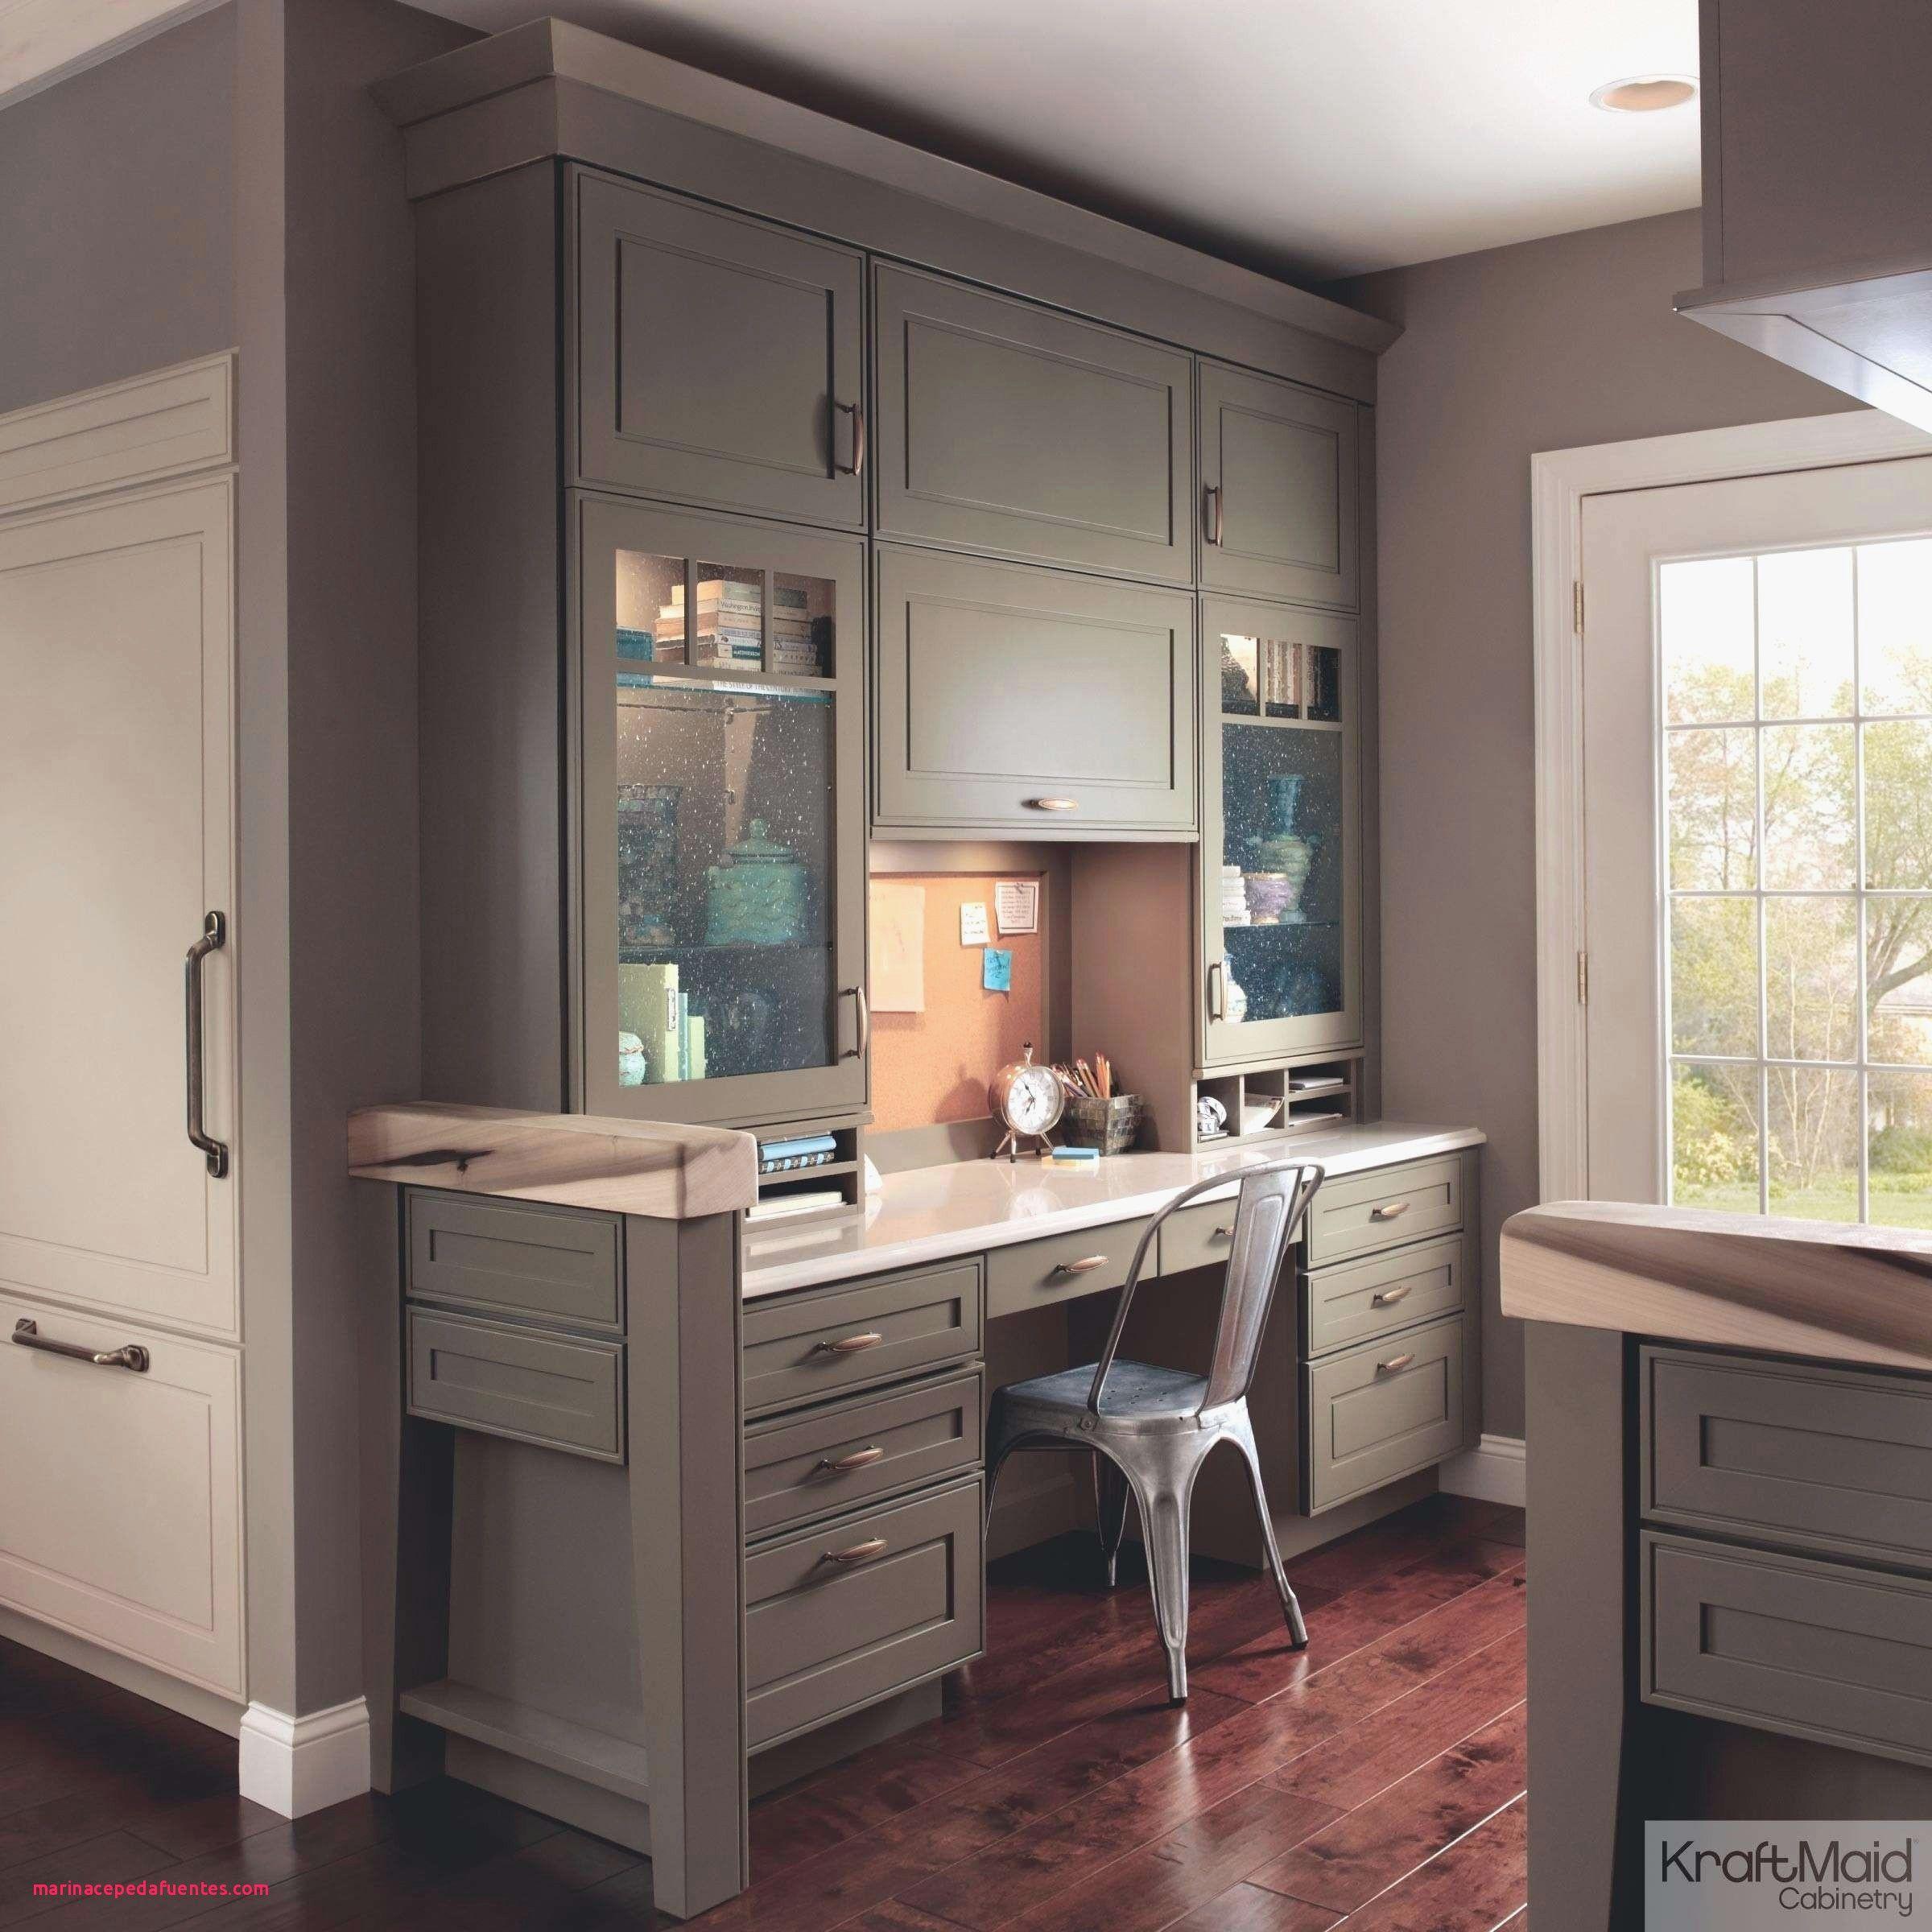 Elegant Kitchen Cabinets orange County – The Stylish as well ...